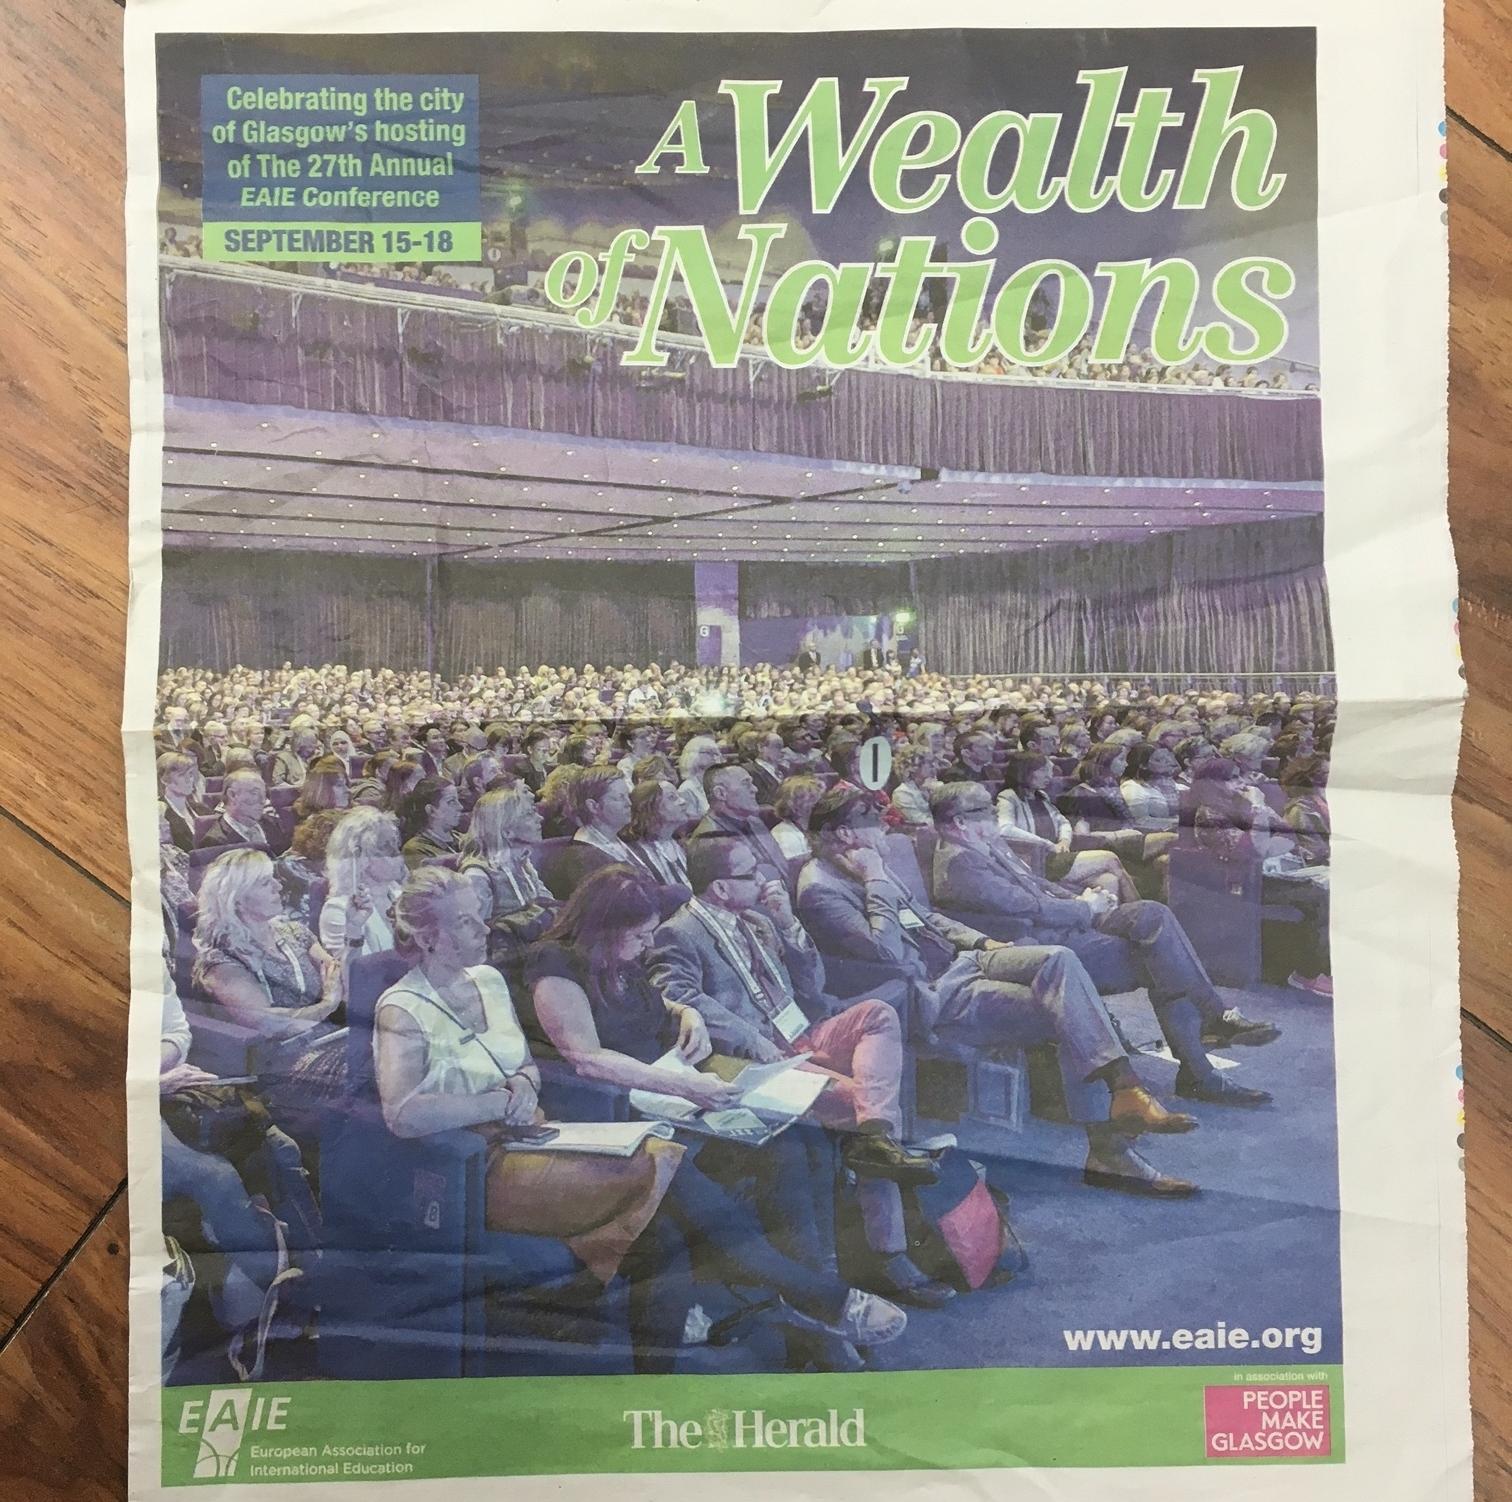 Supplement in the Glasgow Herald.